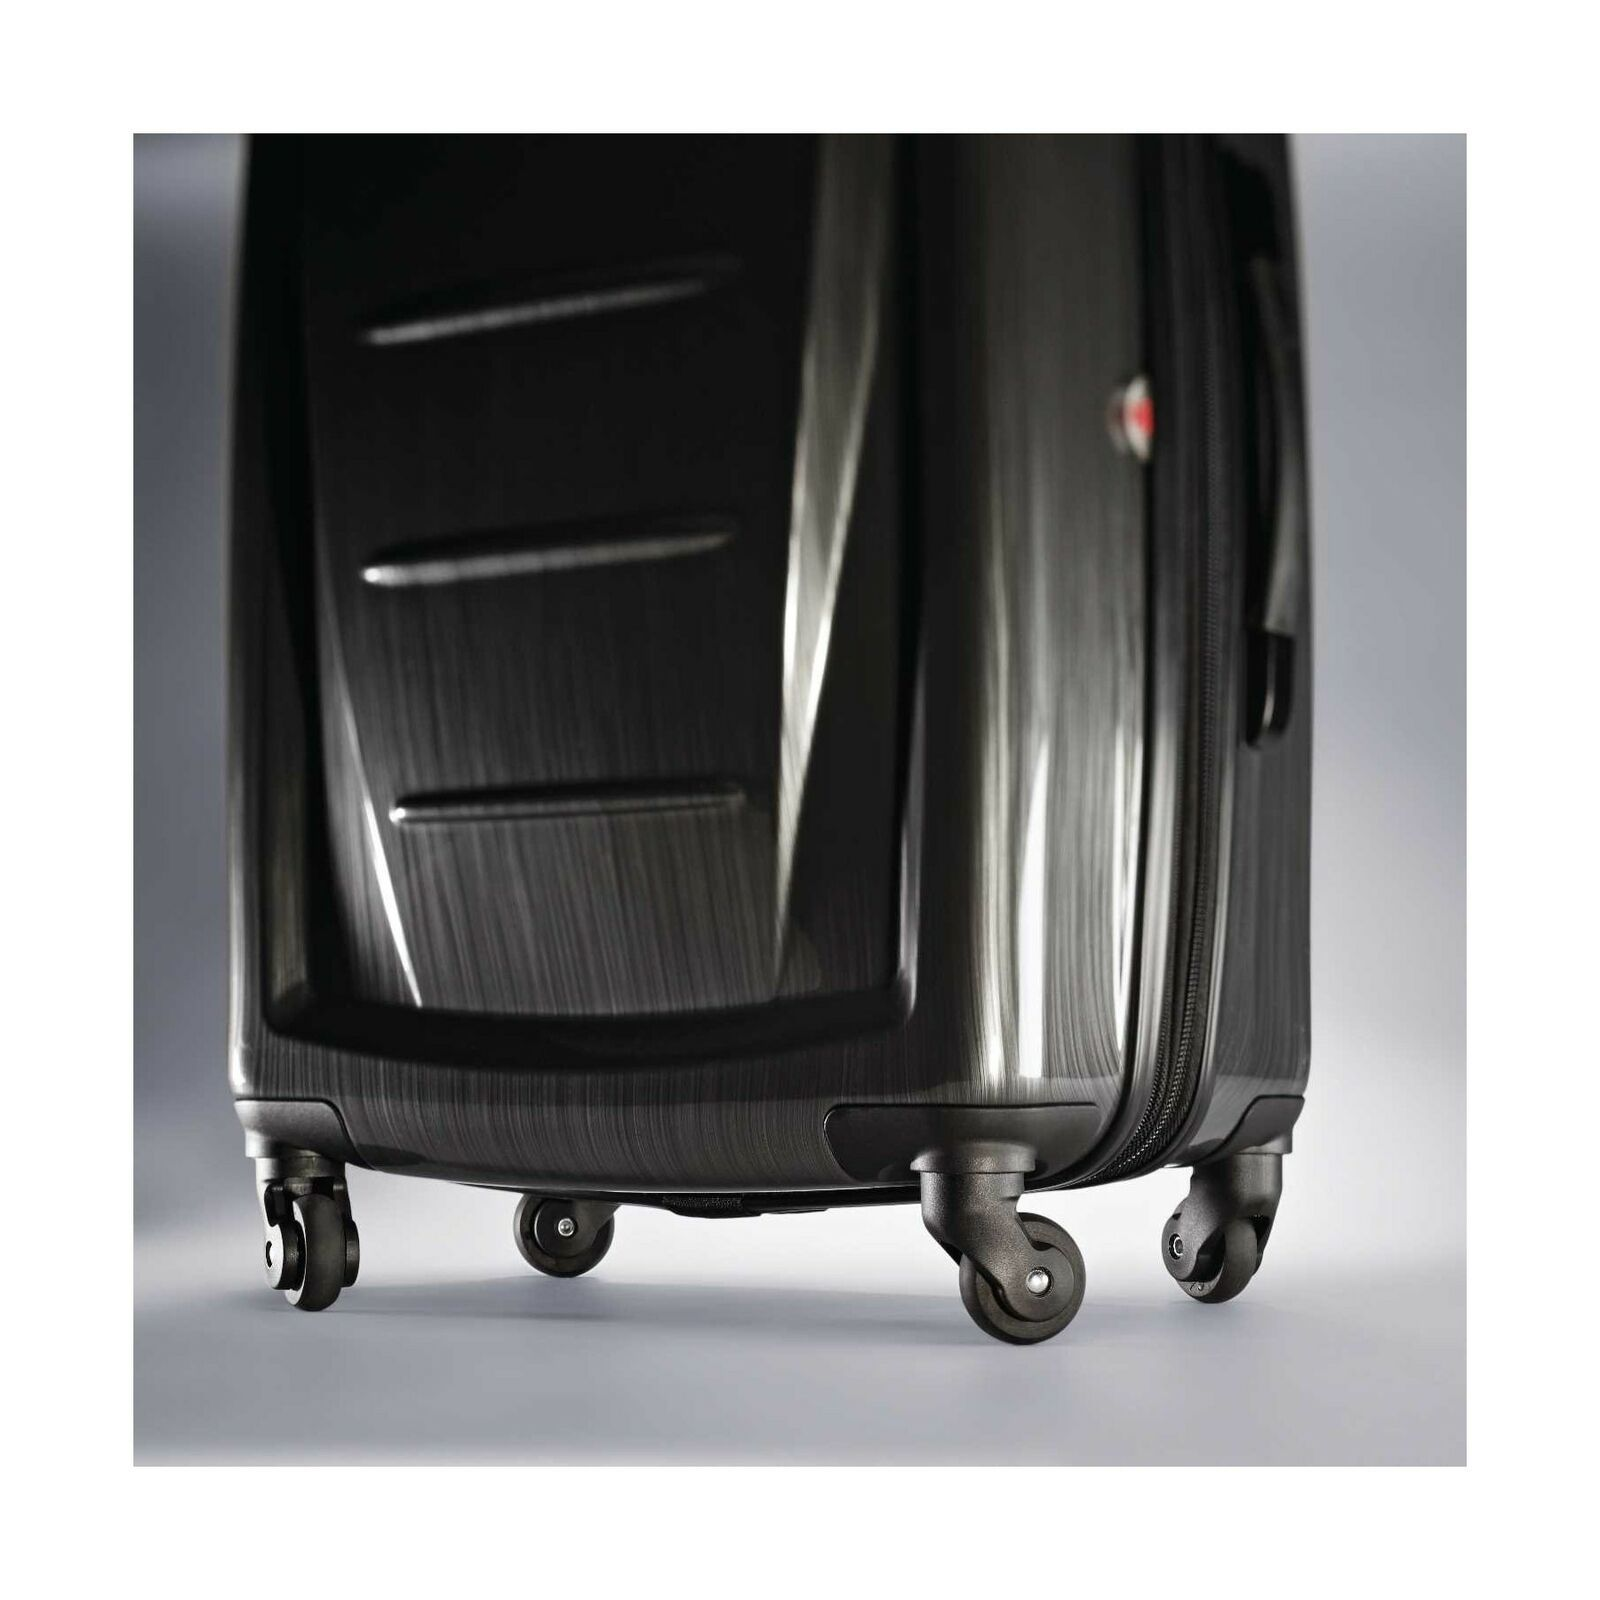 "Samsonite Winfield Hardside Luggage Brushed Anthracite 20"" Travel Suitcase Bag"